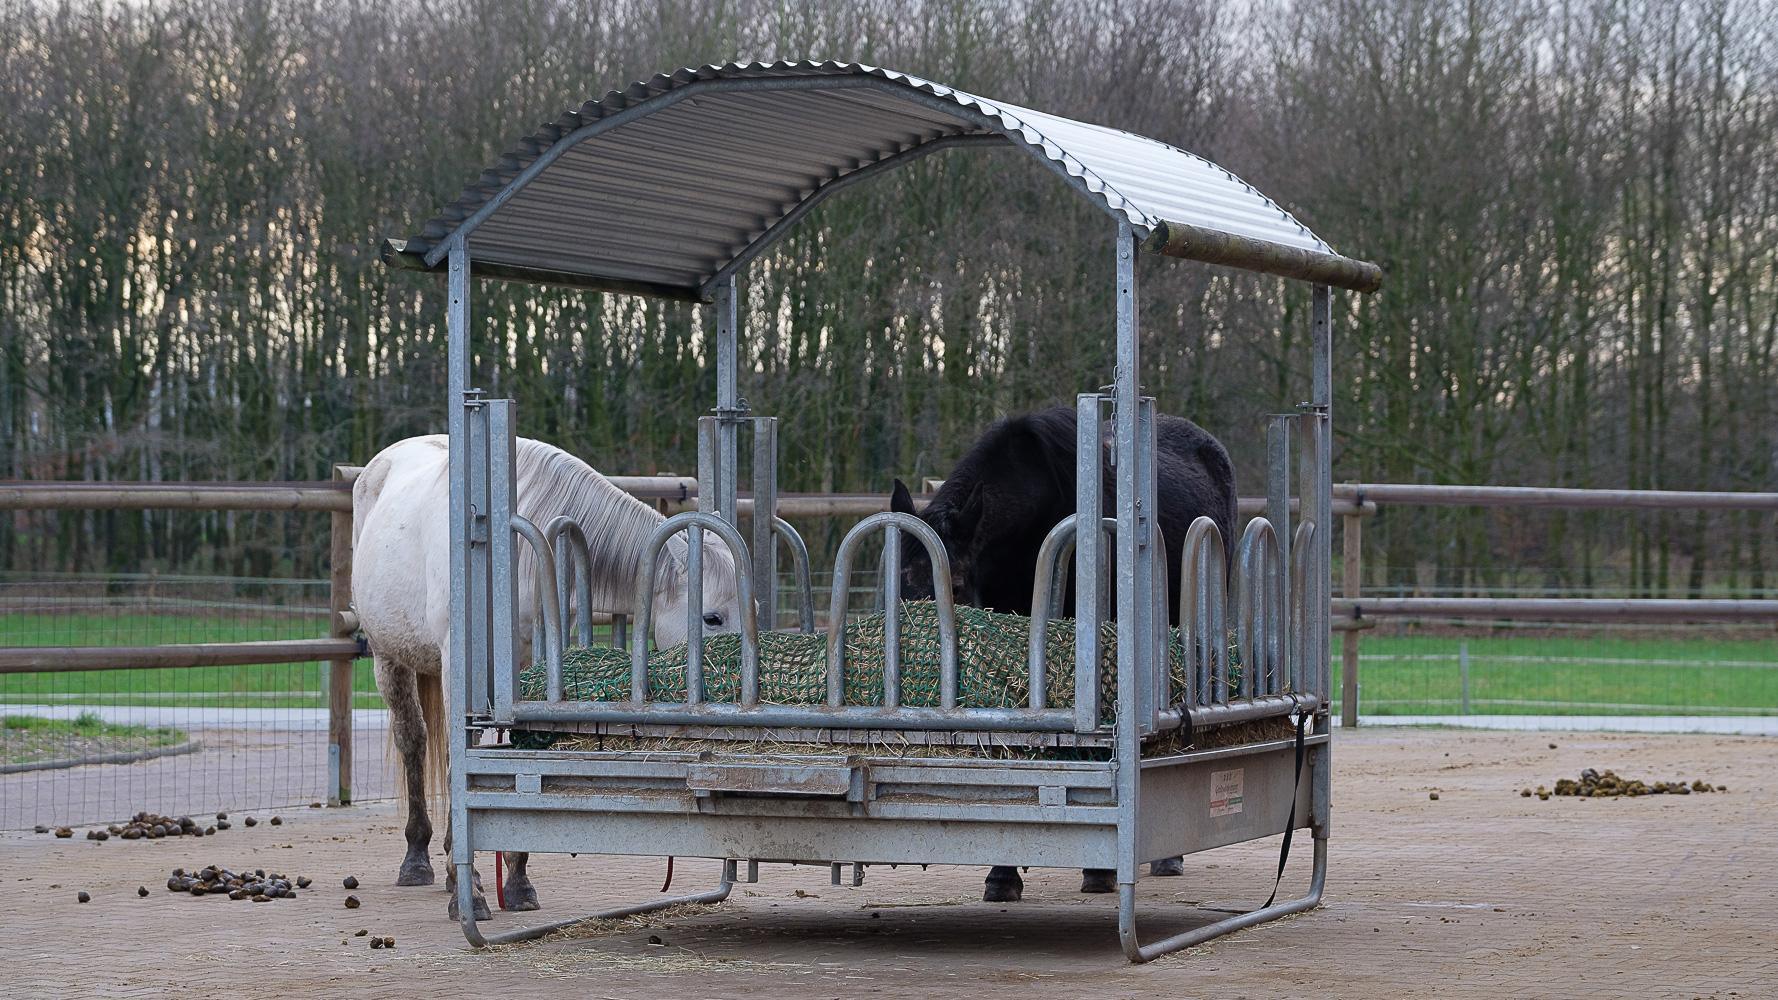 Pferde fressen Heu aus der Raufe. Foto: Ana Springfeldt, www.springfeldtprofifoto.com